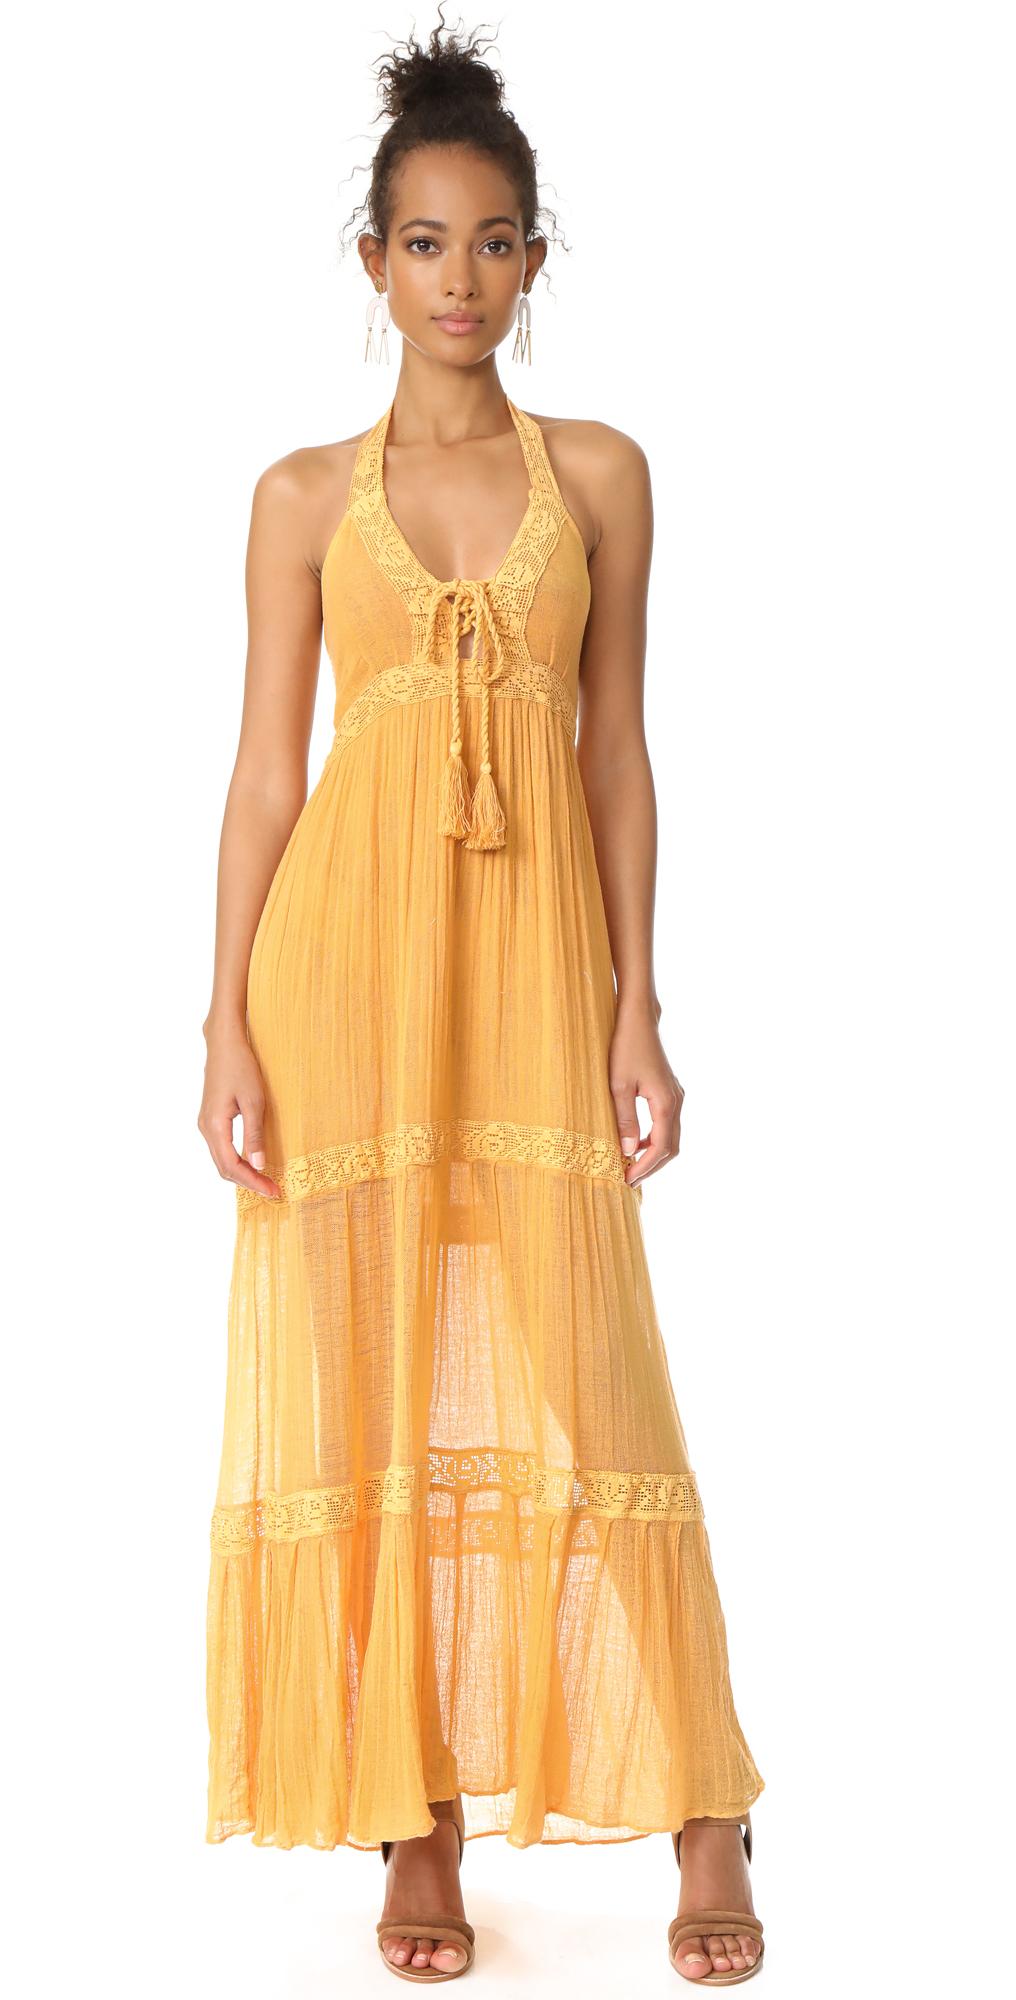 Paseo Del Sol Dress Jen's Pirate Booty